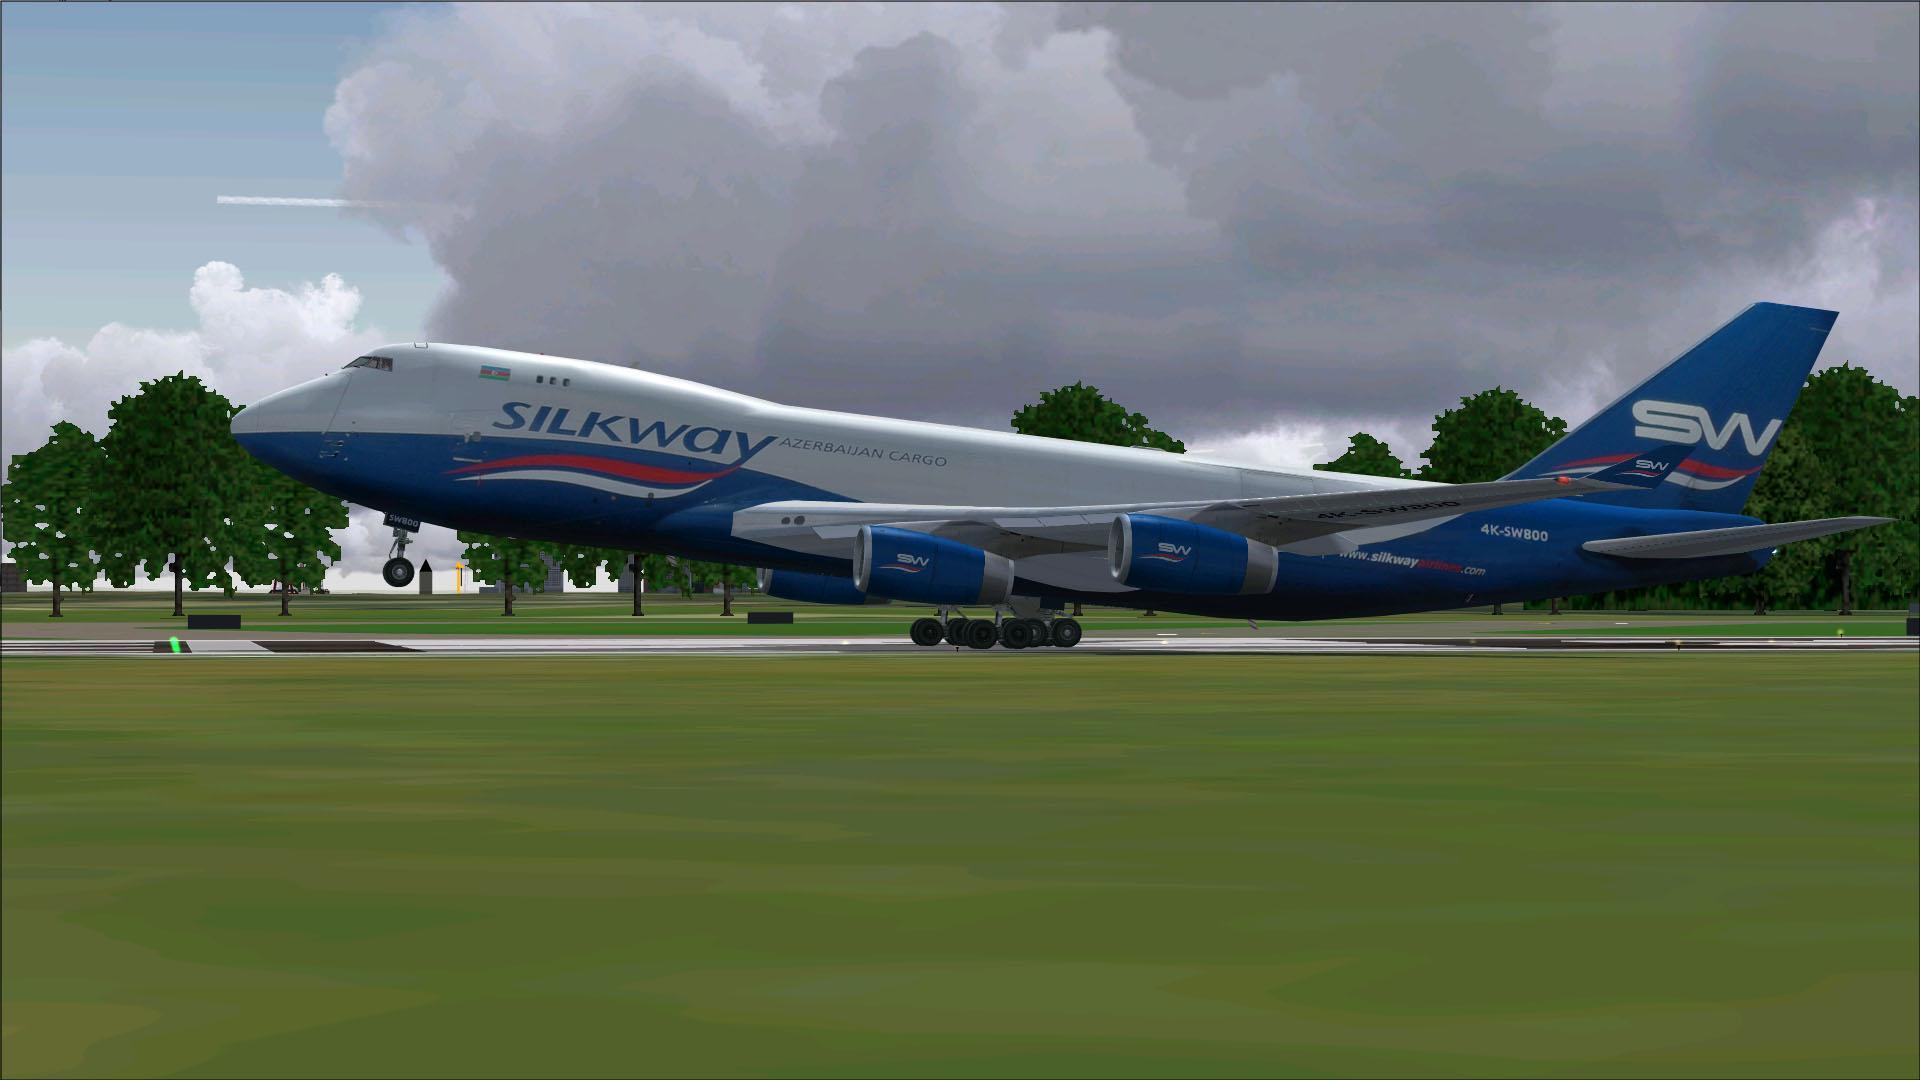 fs-freeware net - FSX Boeing 747-400 Cargo Silkway Azerbaijan with VC